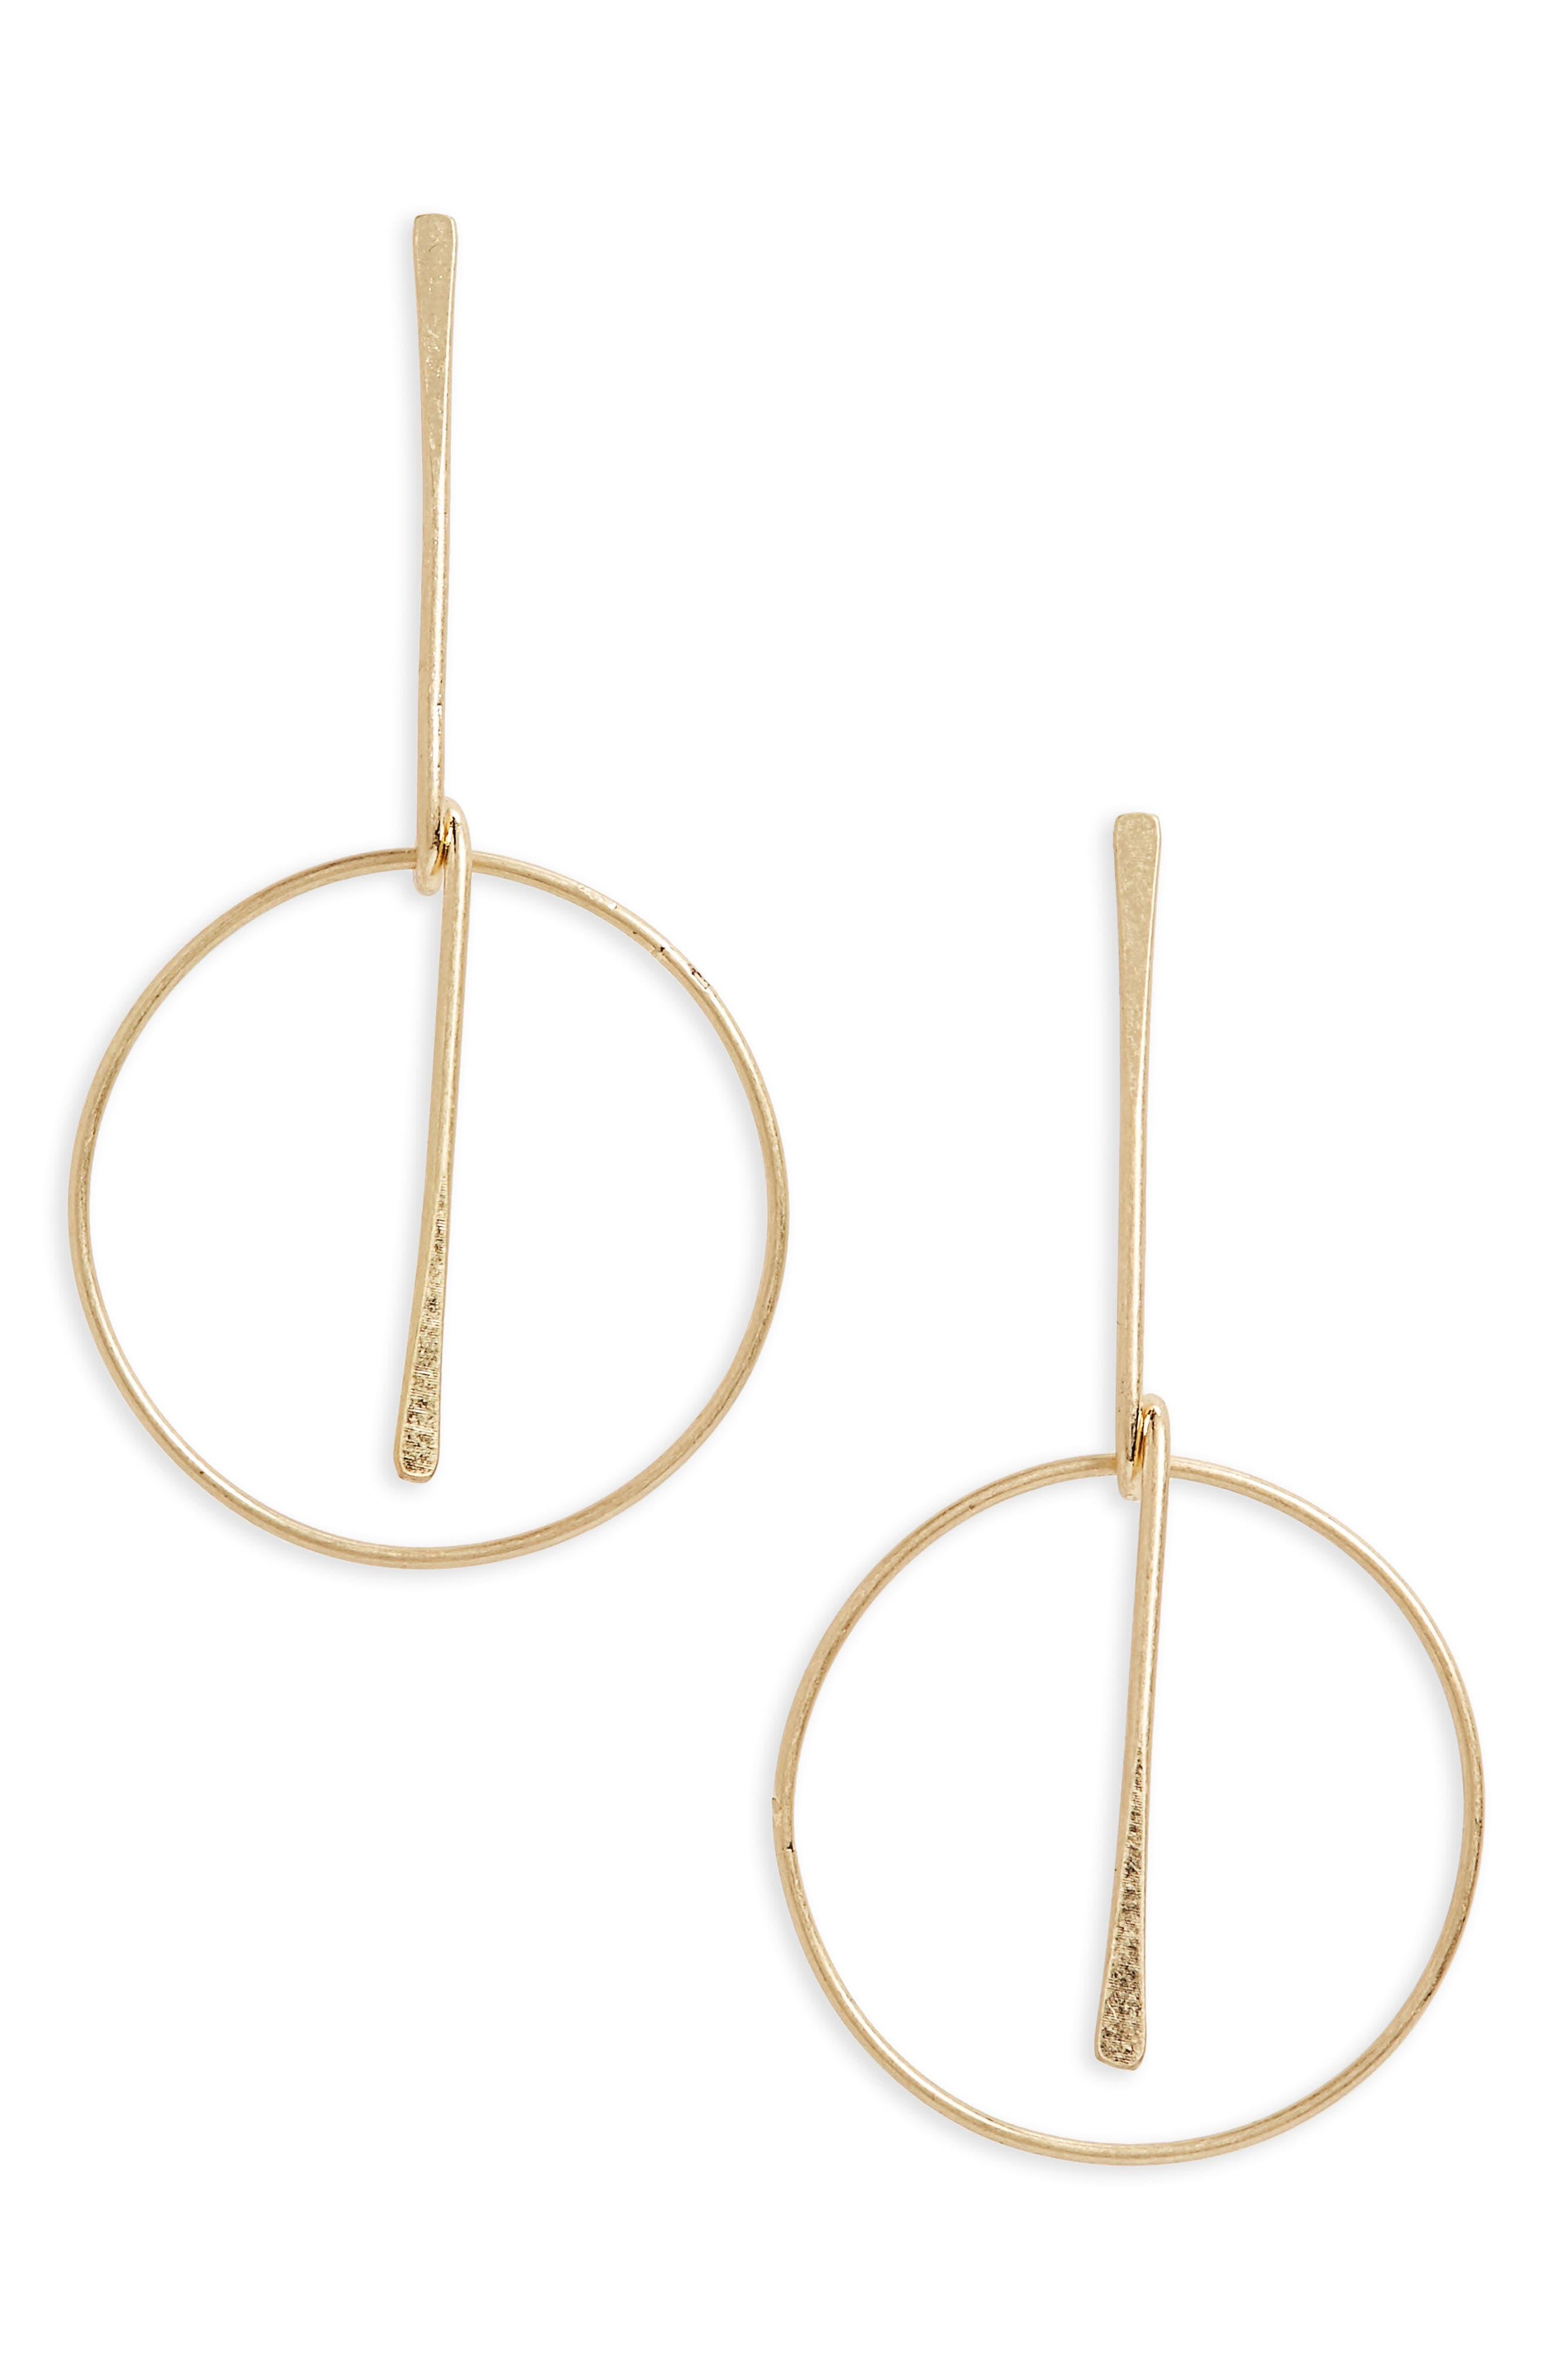 Main Image - Canvas Jewelry Frontal Hoop Earrings